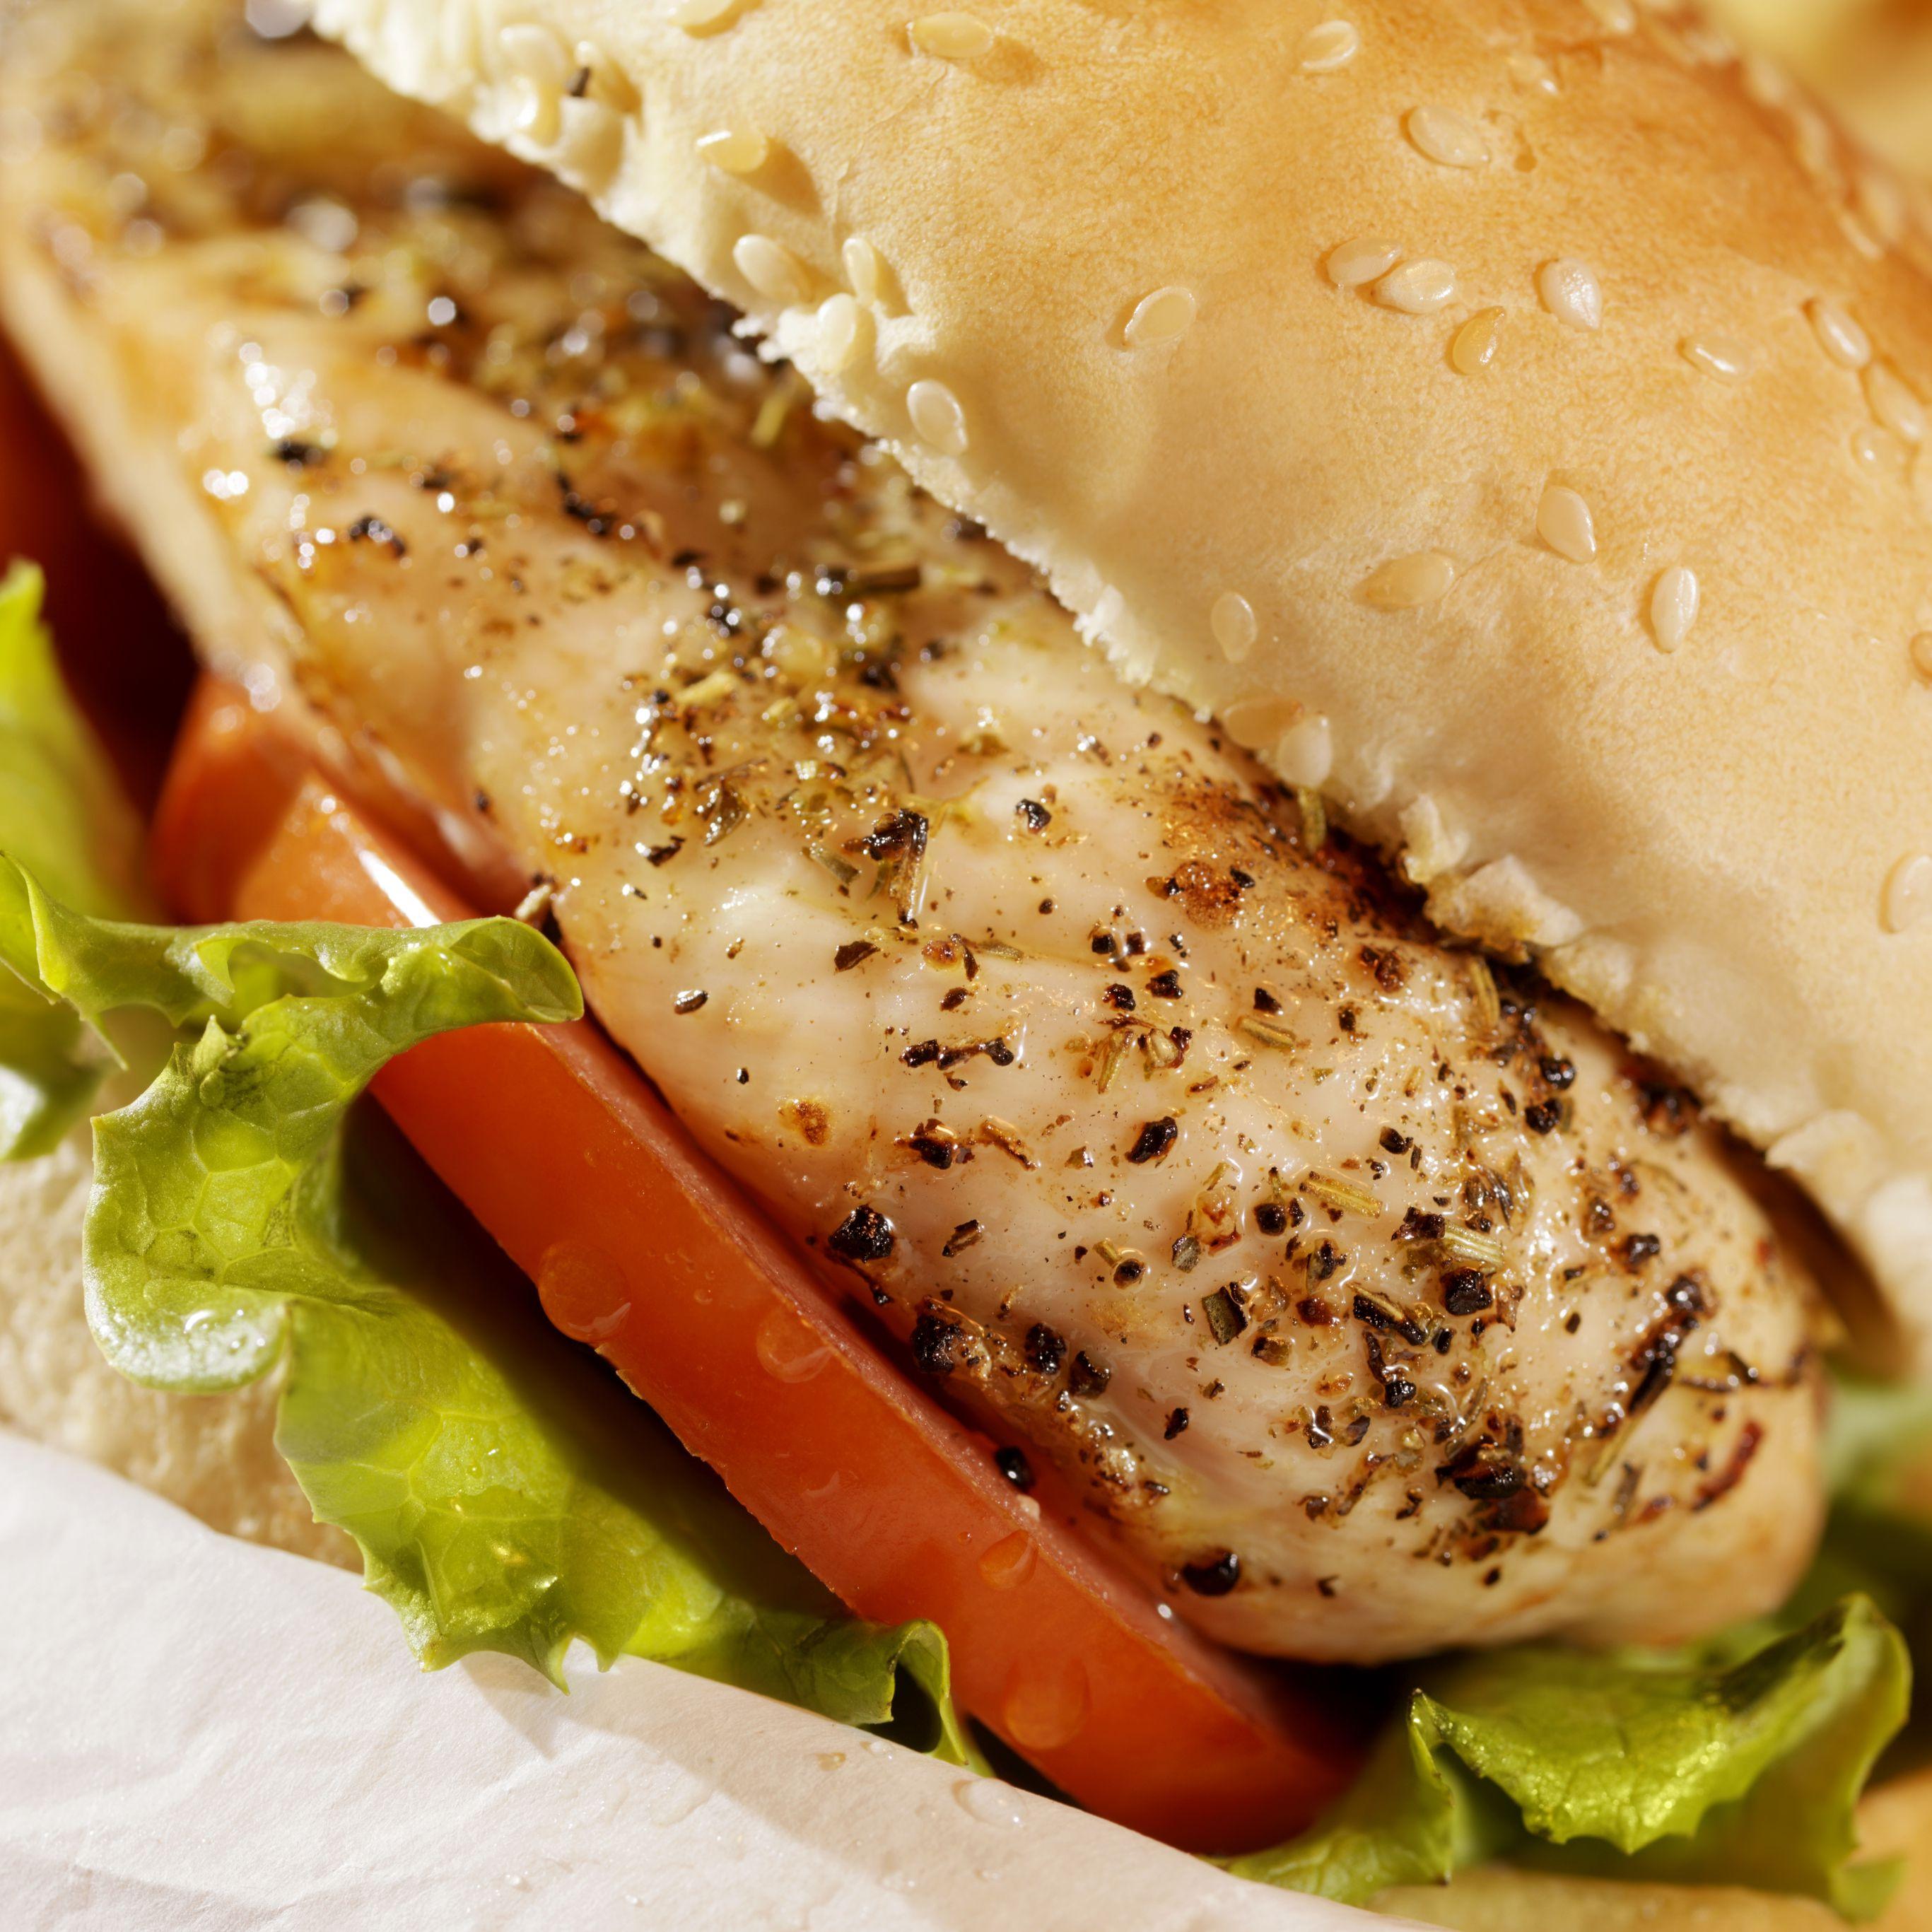 Chick fil a sandwich nutrition facts